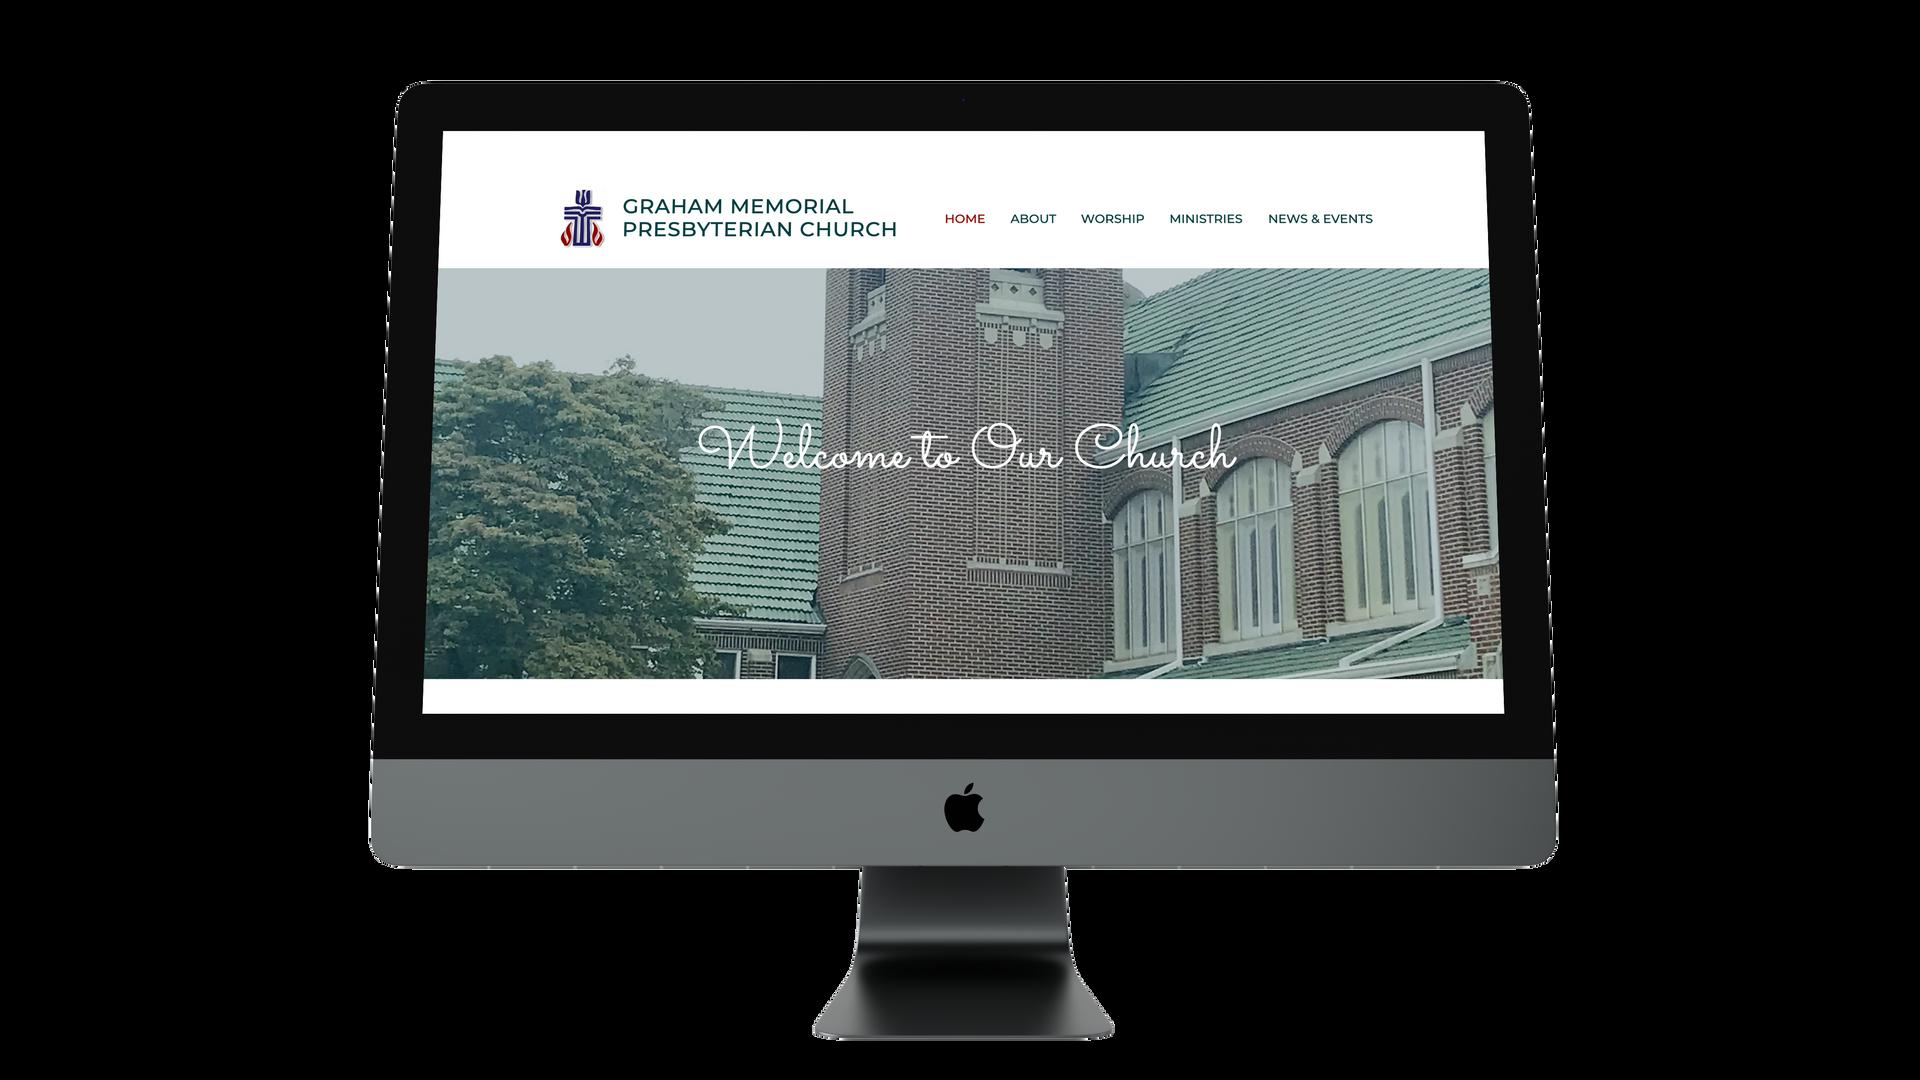 Graham Memorial Presbyterian Church